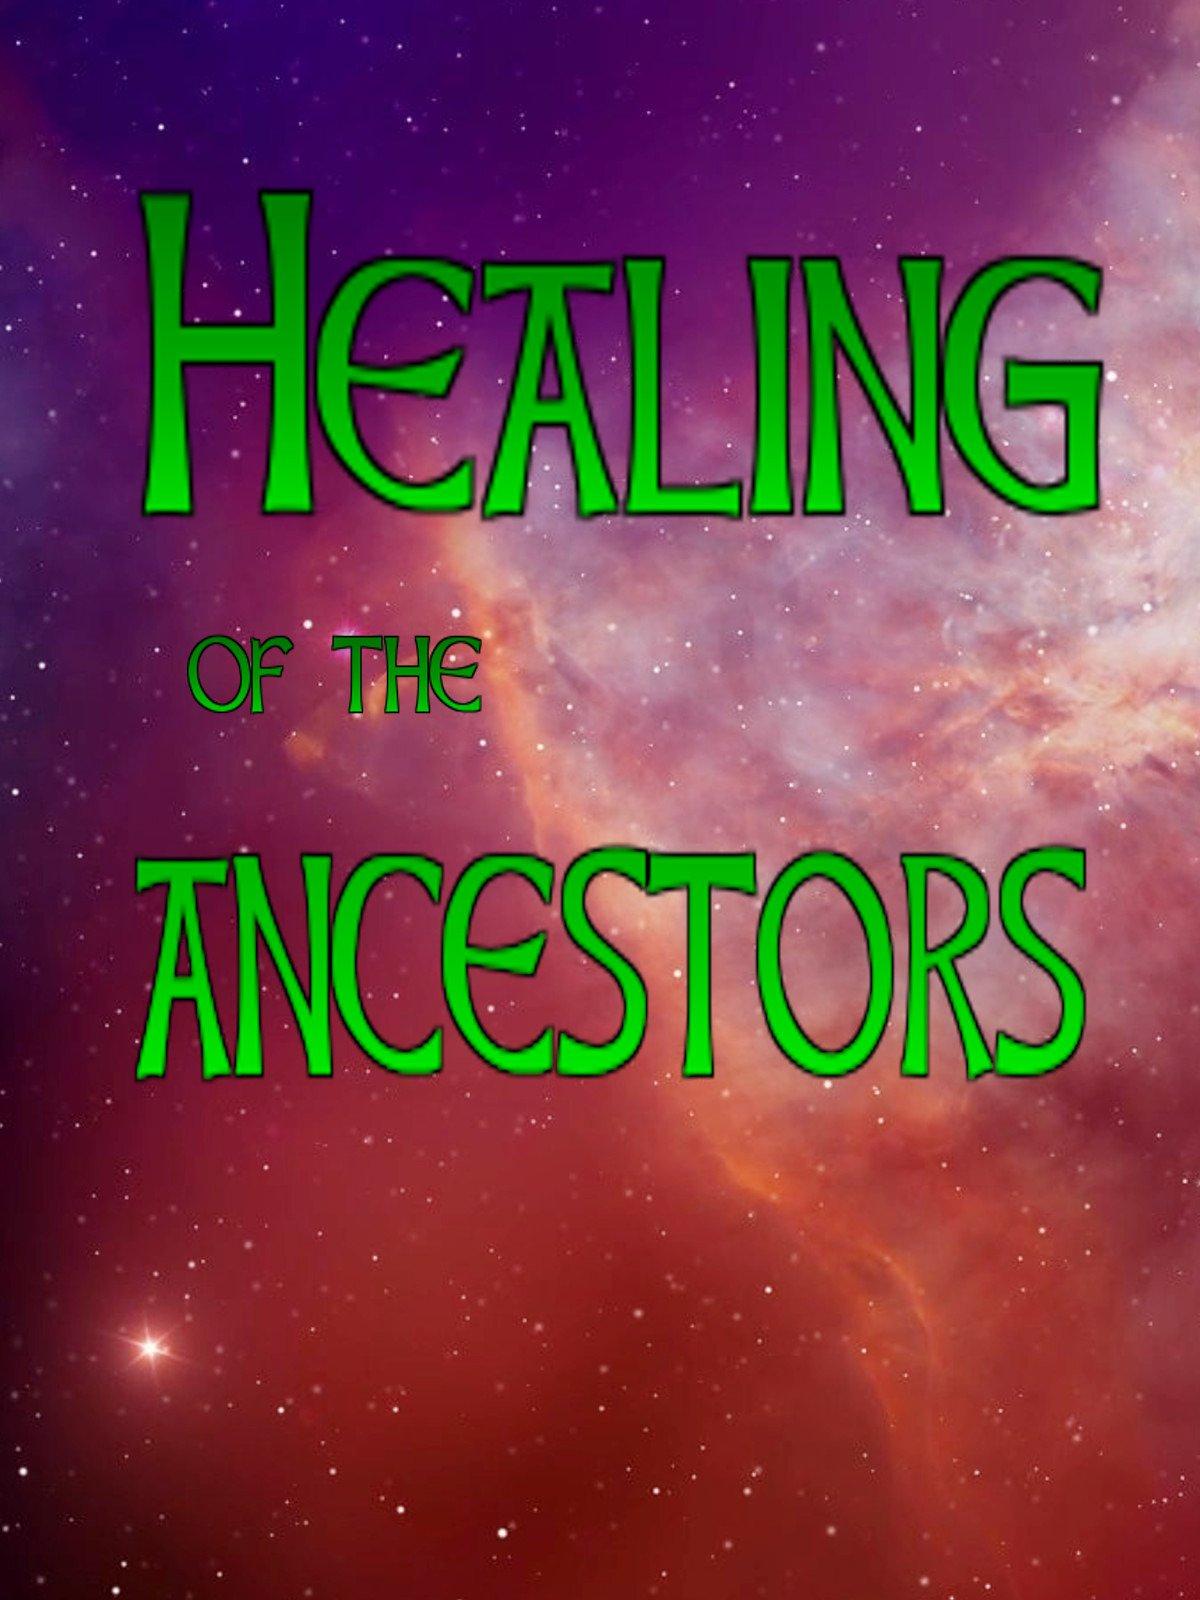 Healing of the ancestors